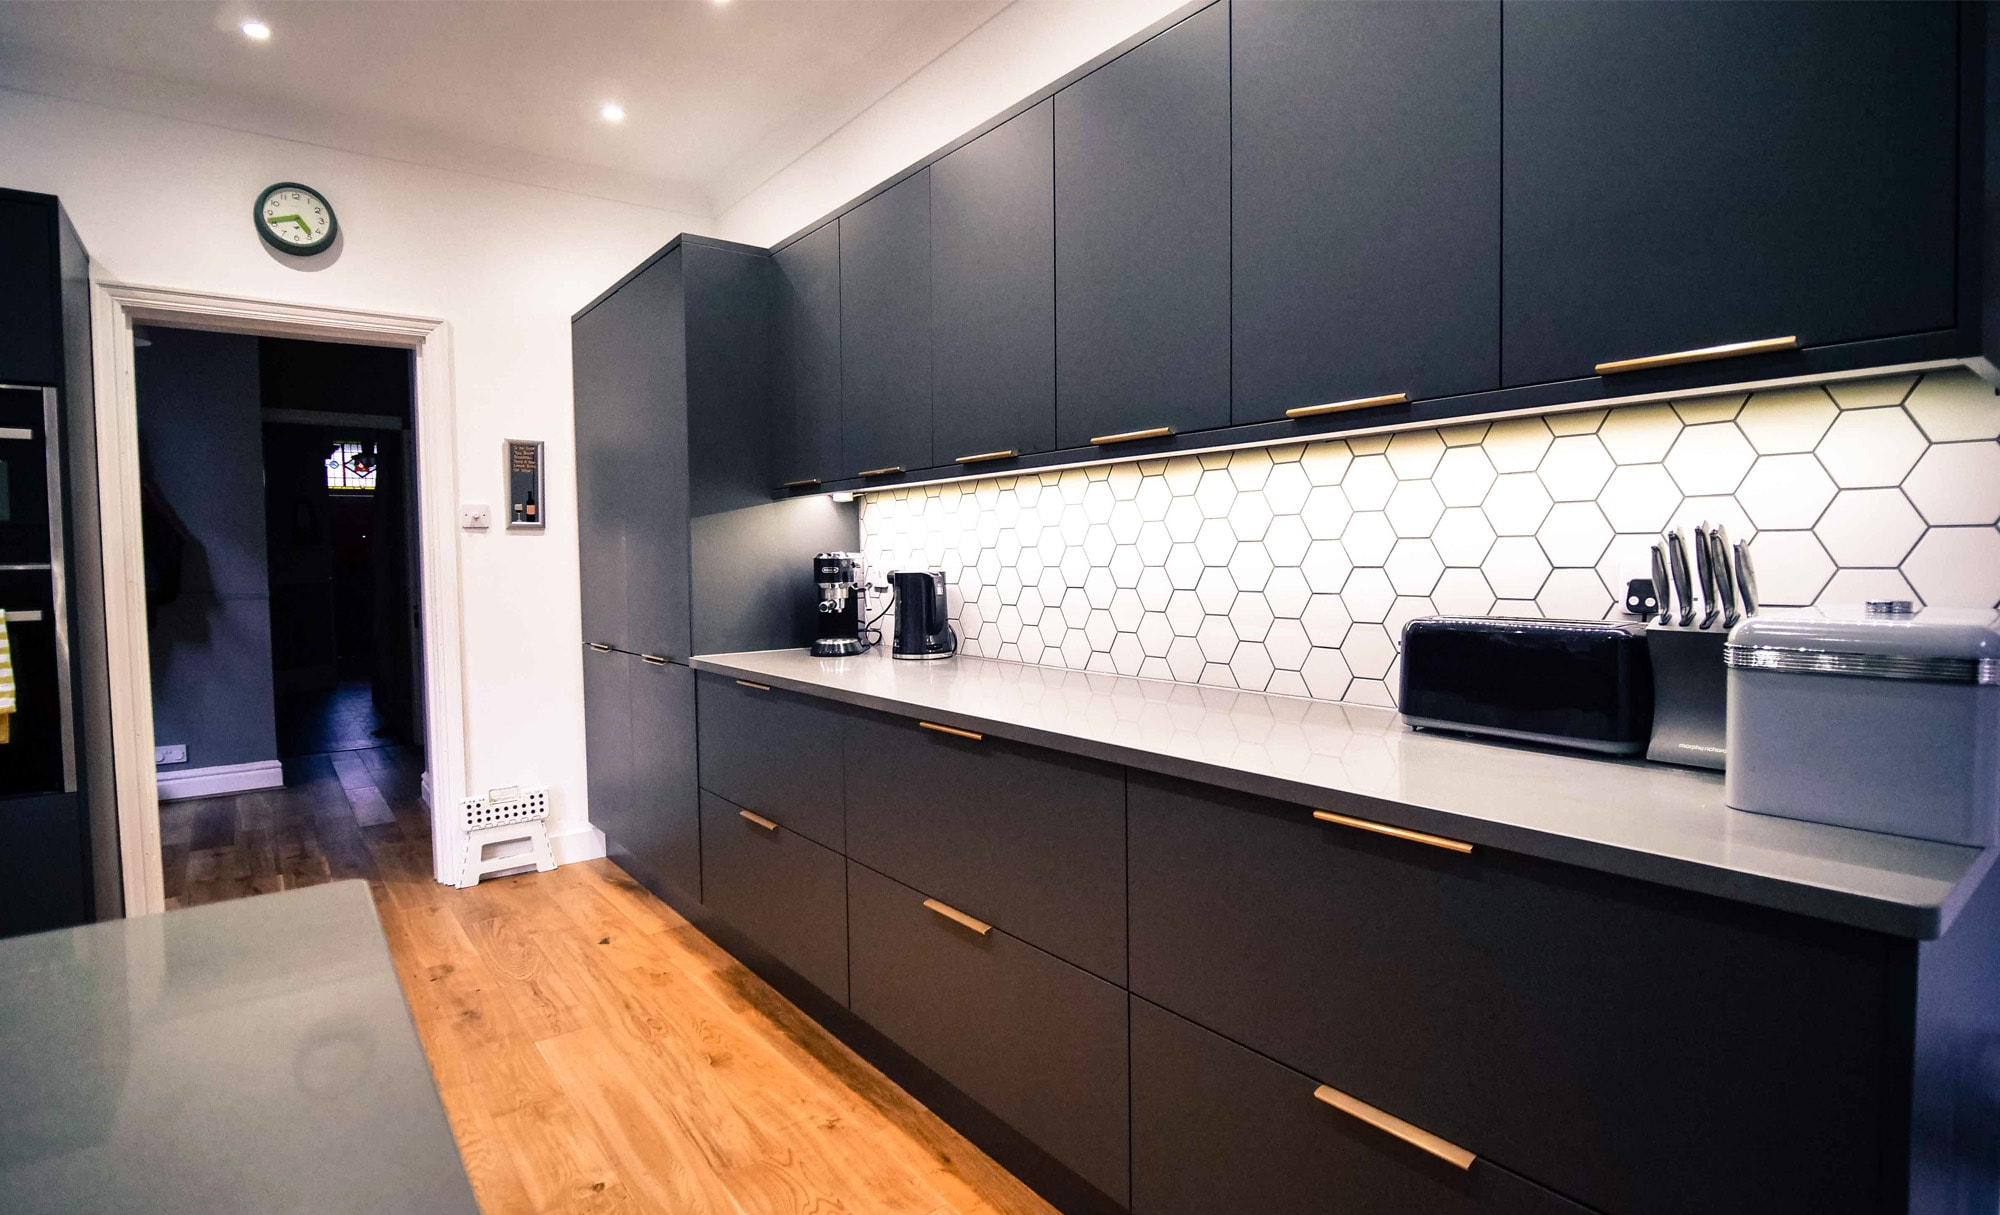 The Gallery Zola Matte Graphite Kitchen Cabinets